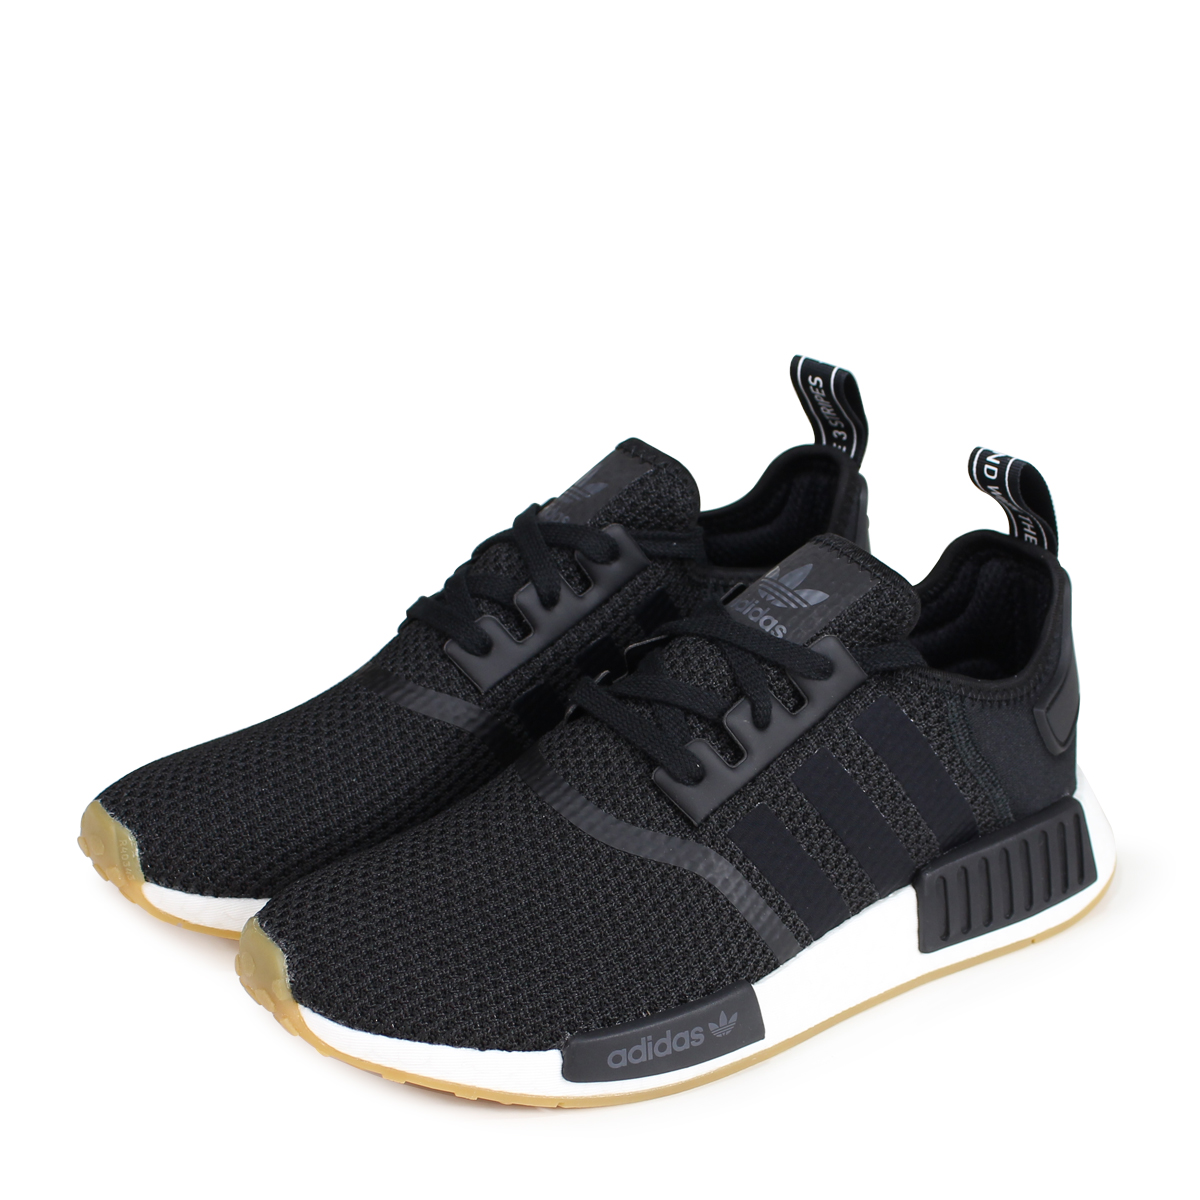 adidas Originals NMD R1 Adidas originals sneakers N M D nomad men B42200 black [77 Shinnyu load] [187]